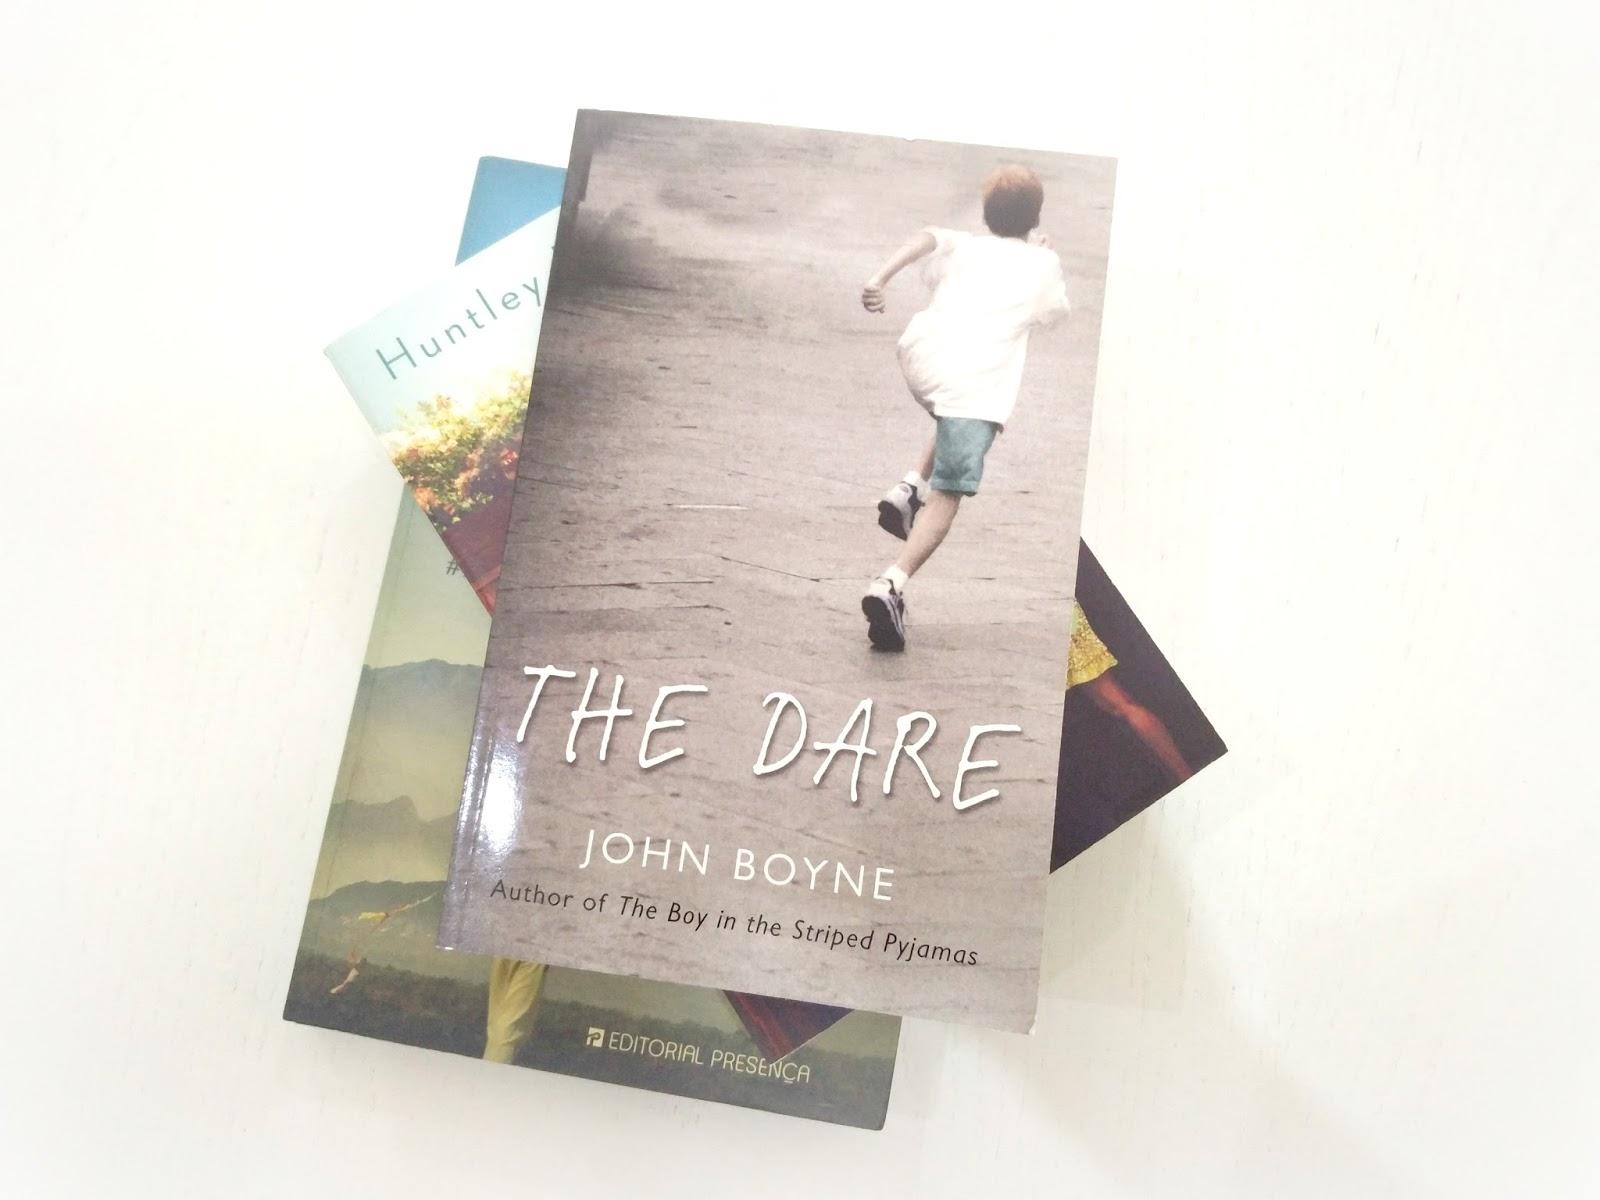 the dare john boyne pdf